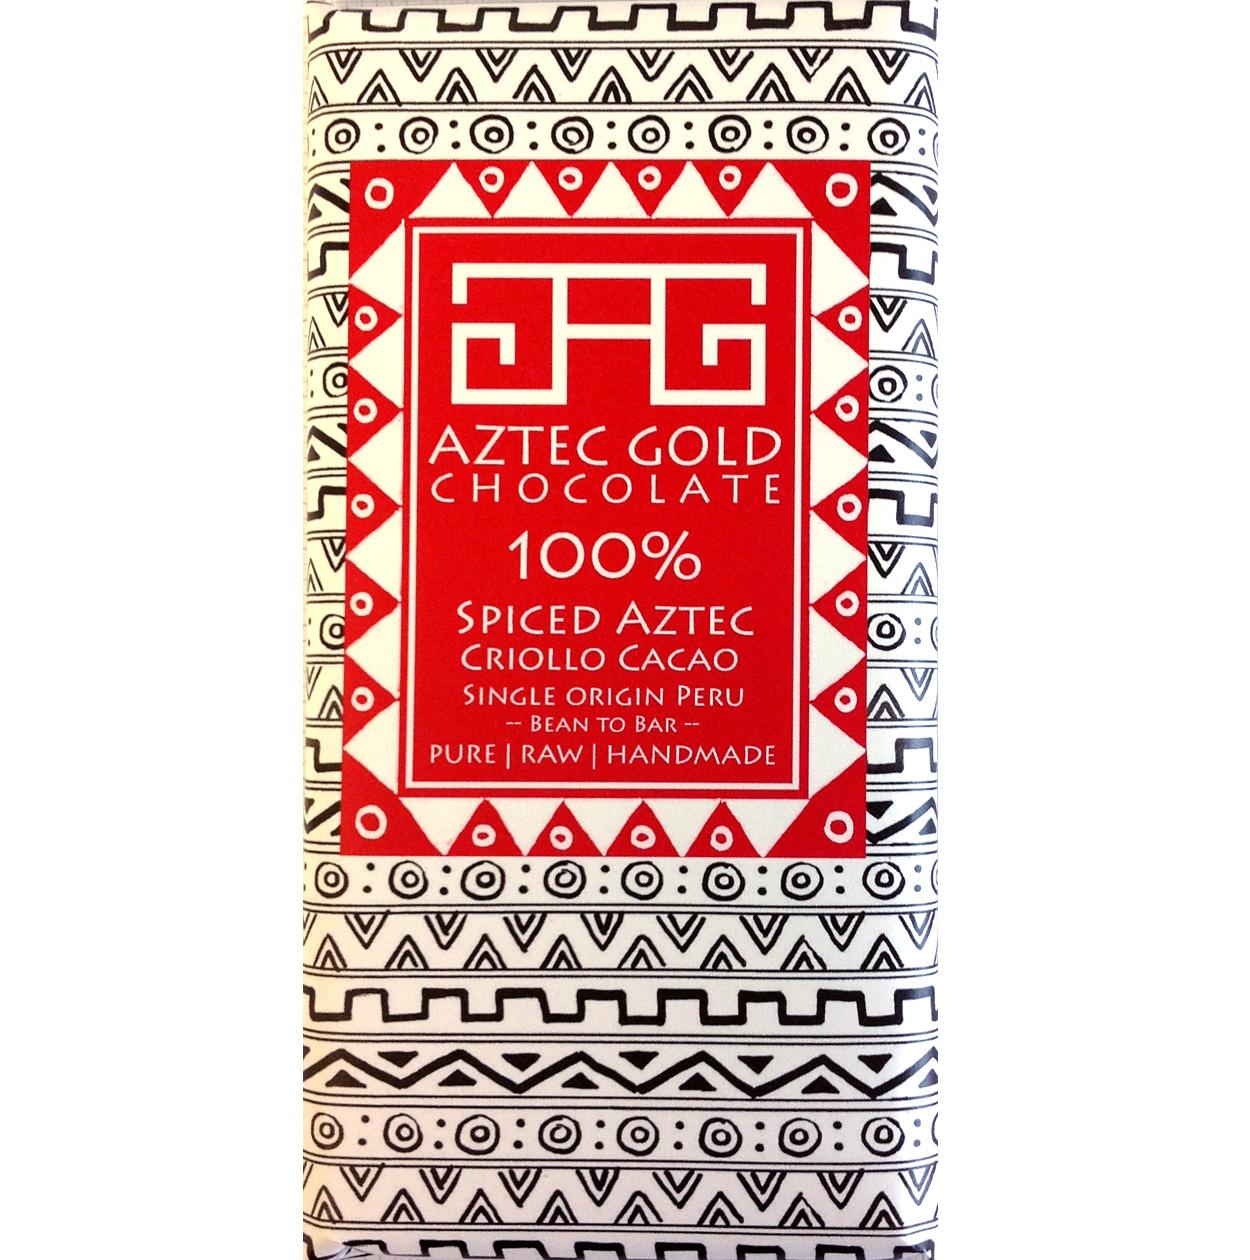 100%-dark-choc-spice-aztec-f.jpg